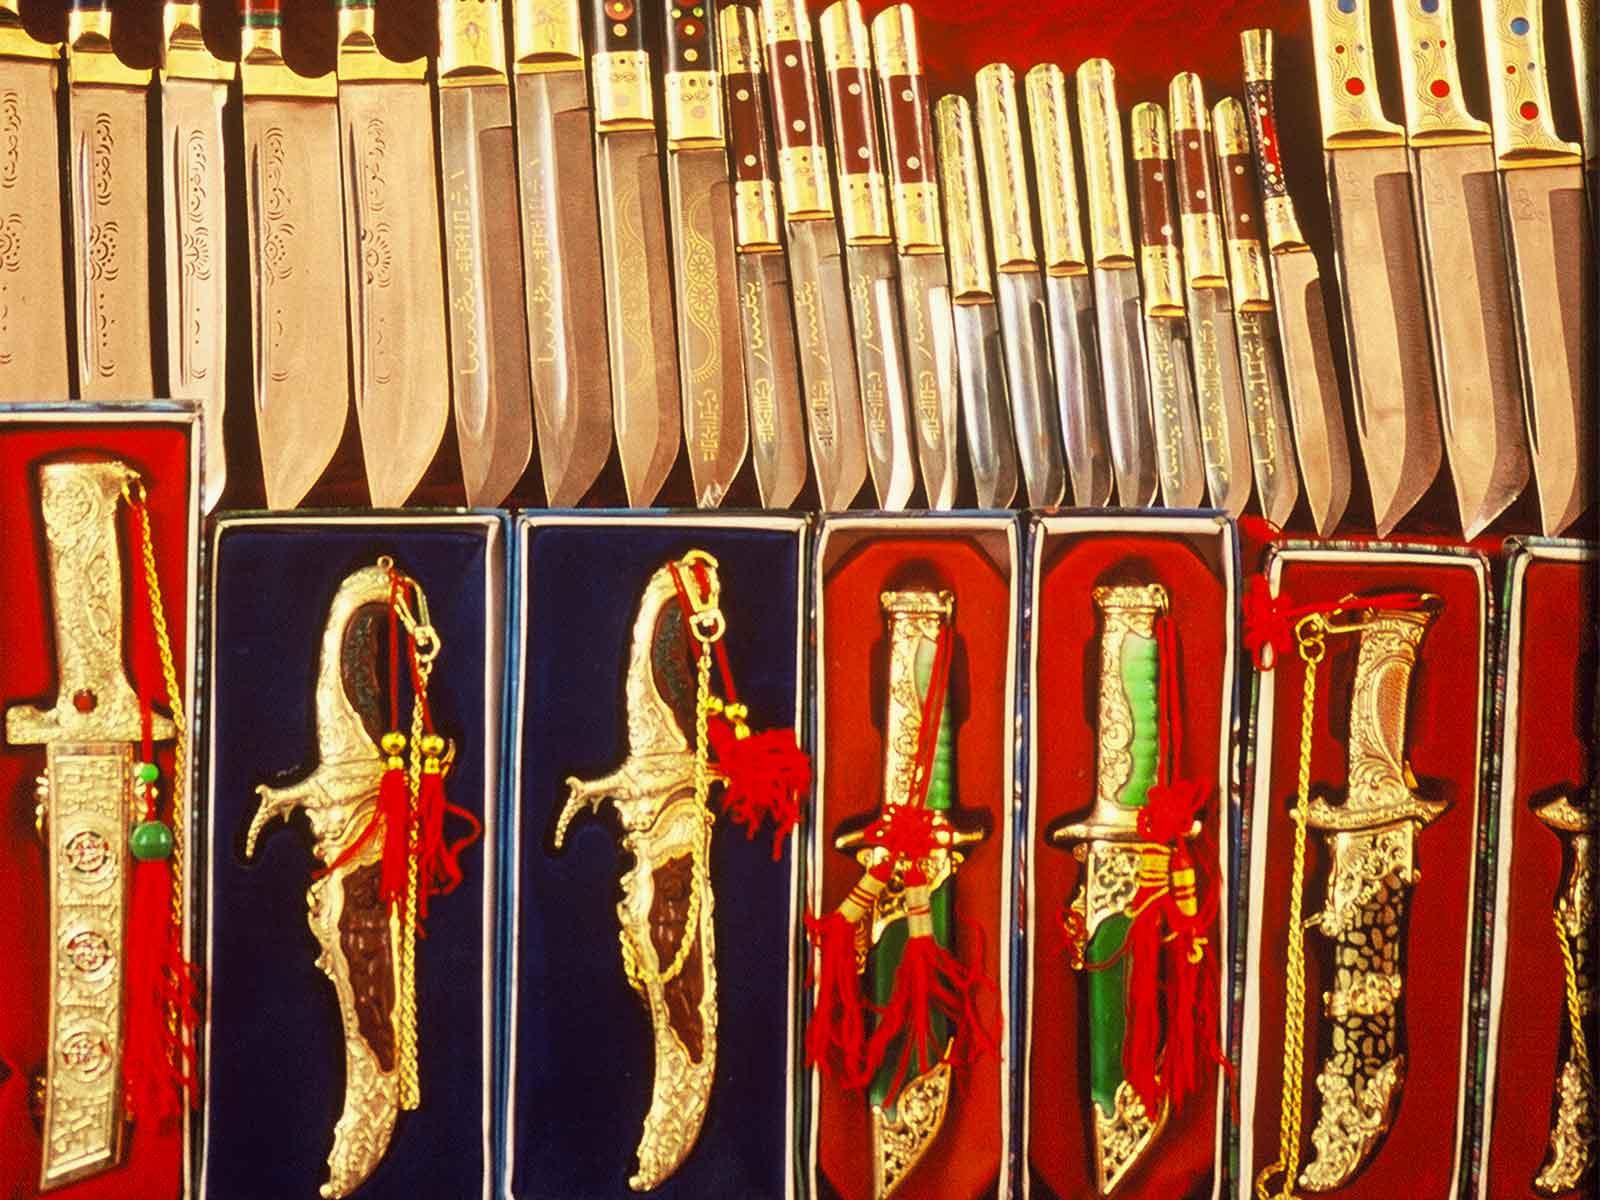 Kashgar Knives - China Silk Road Journal - Dr Steven Andrew Martin - Eastern Civilization Research